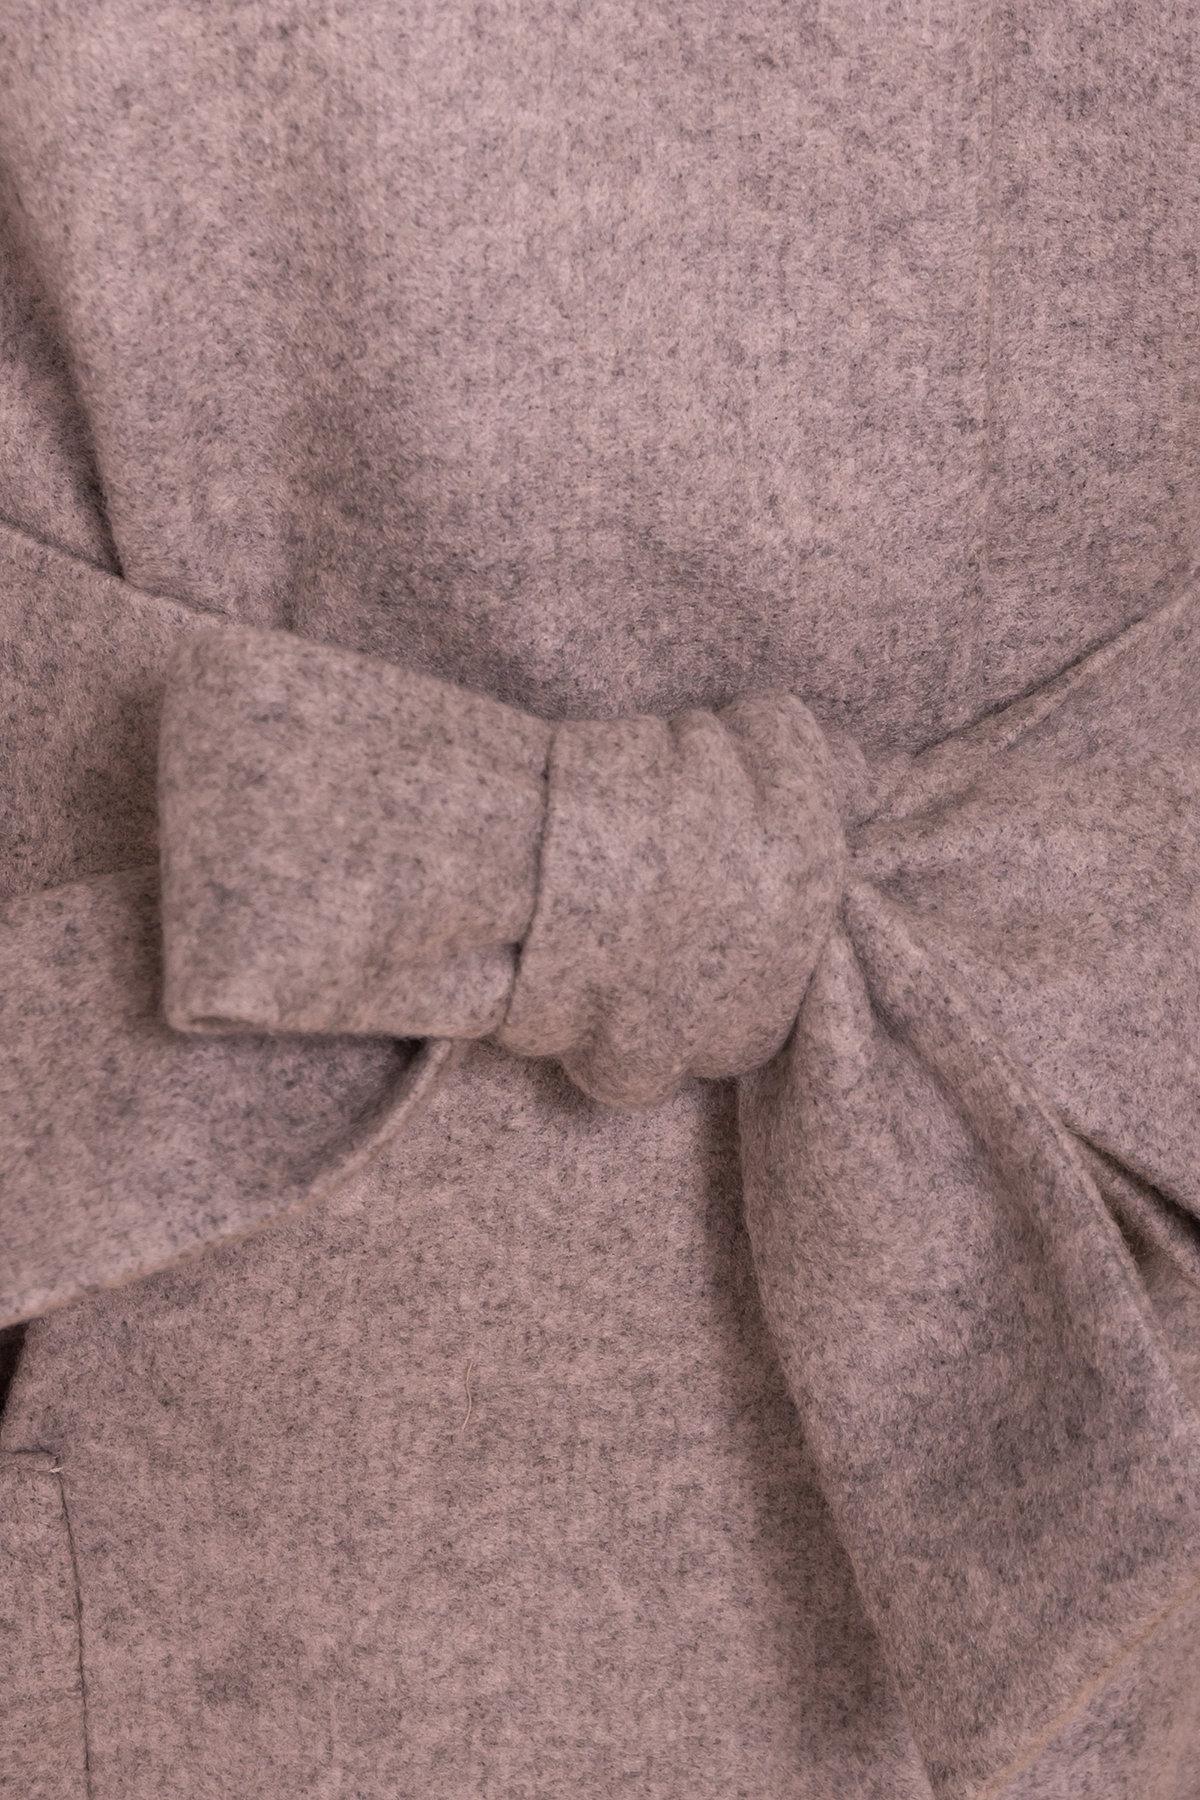 Пальто Кристина лайт 6170 АРТ. 41045 Цвет: Бежевый 31 - фото 6, интернет магазин tm-modus.ru